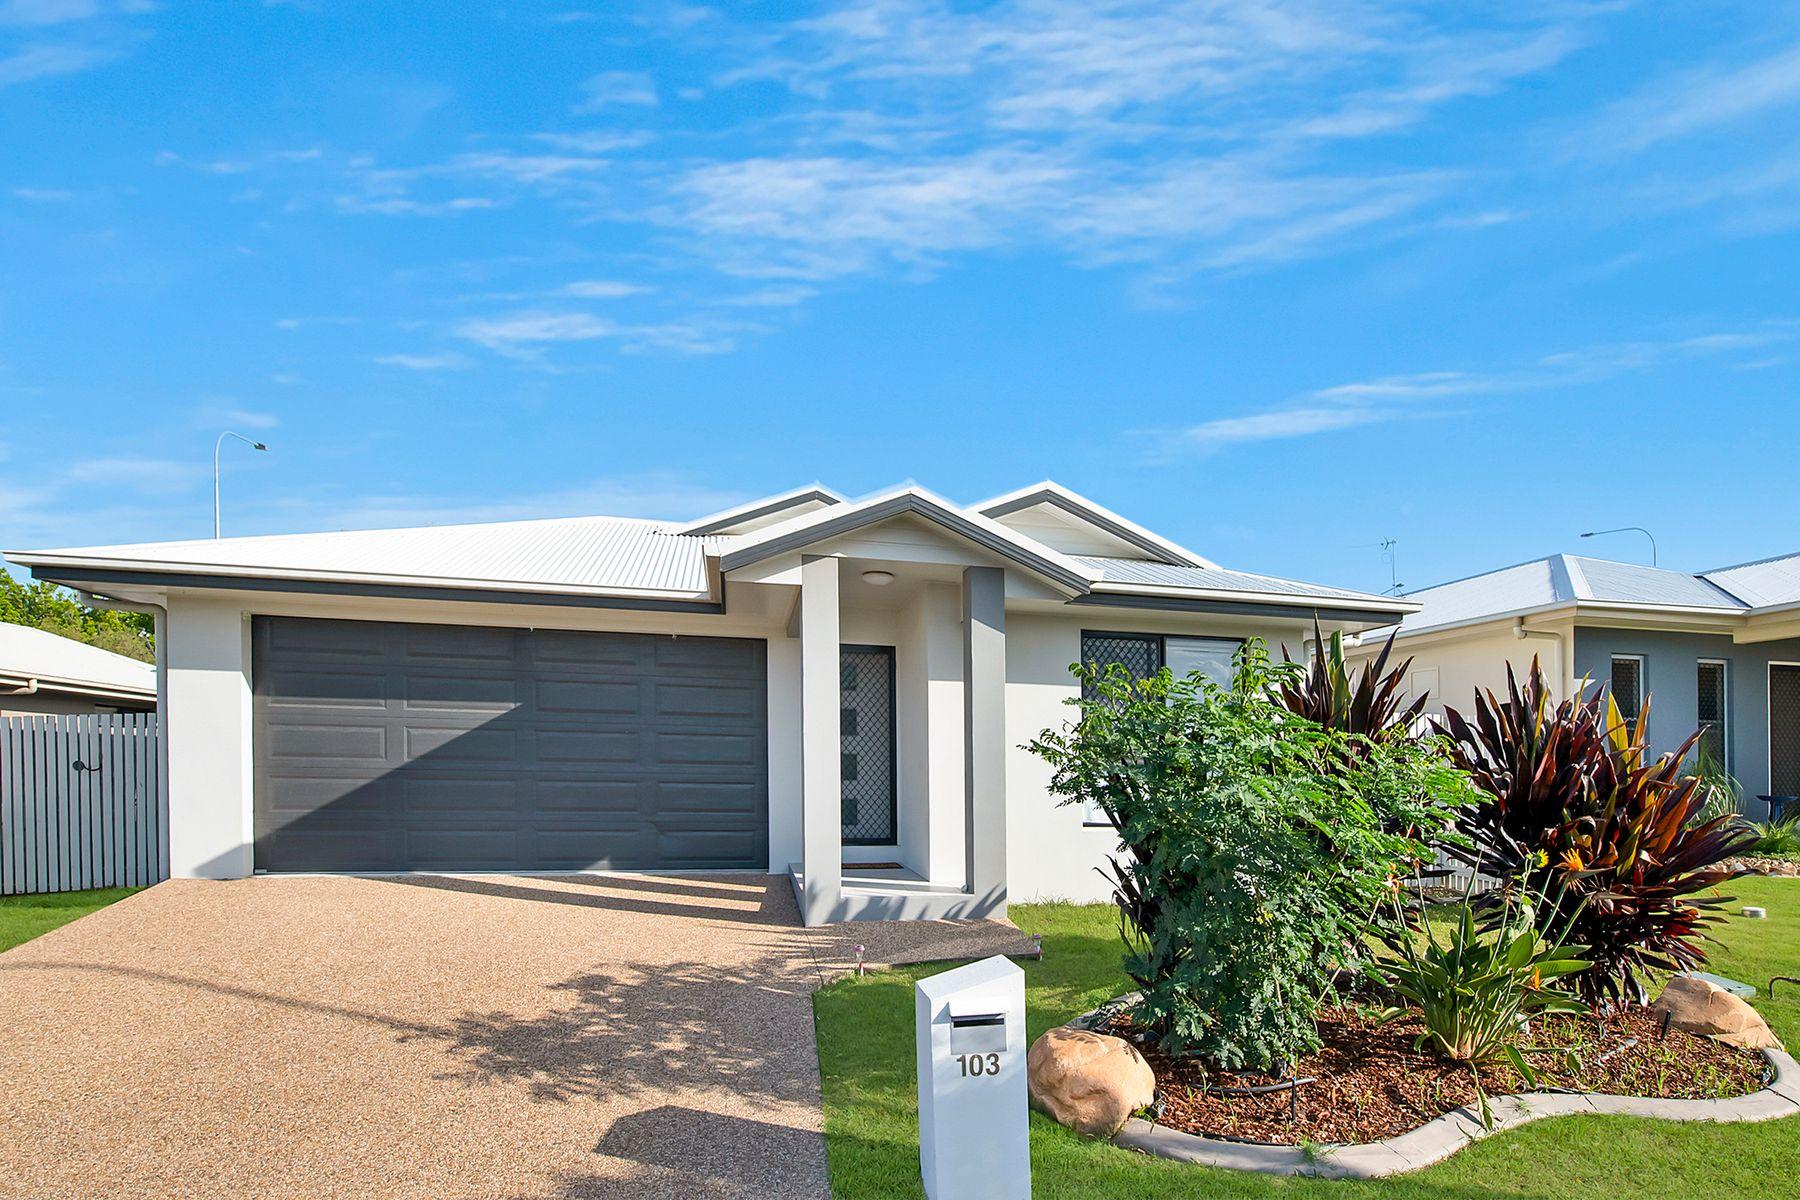 103 Monolith Circuit, Cosgrove, QLD 4818